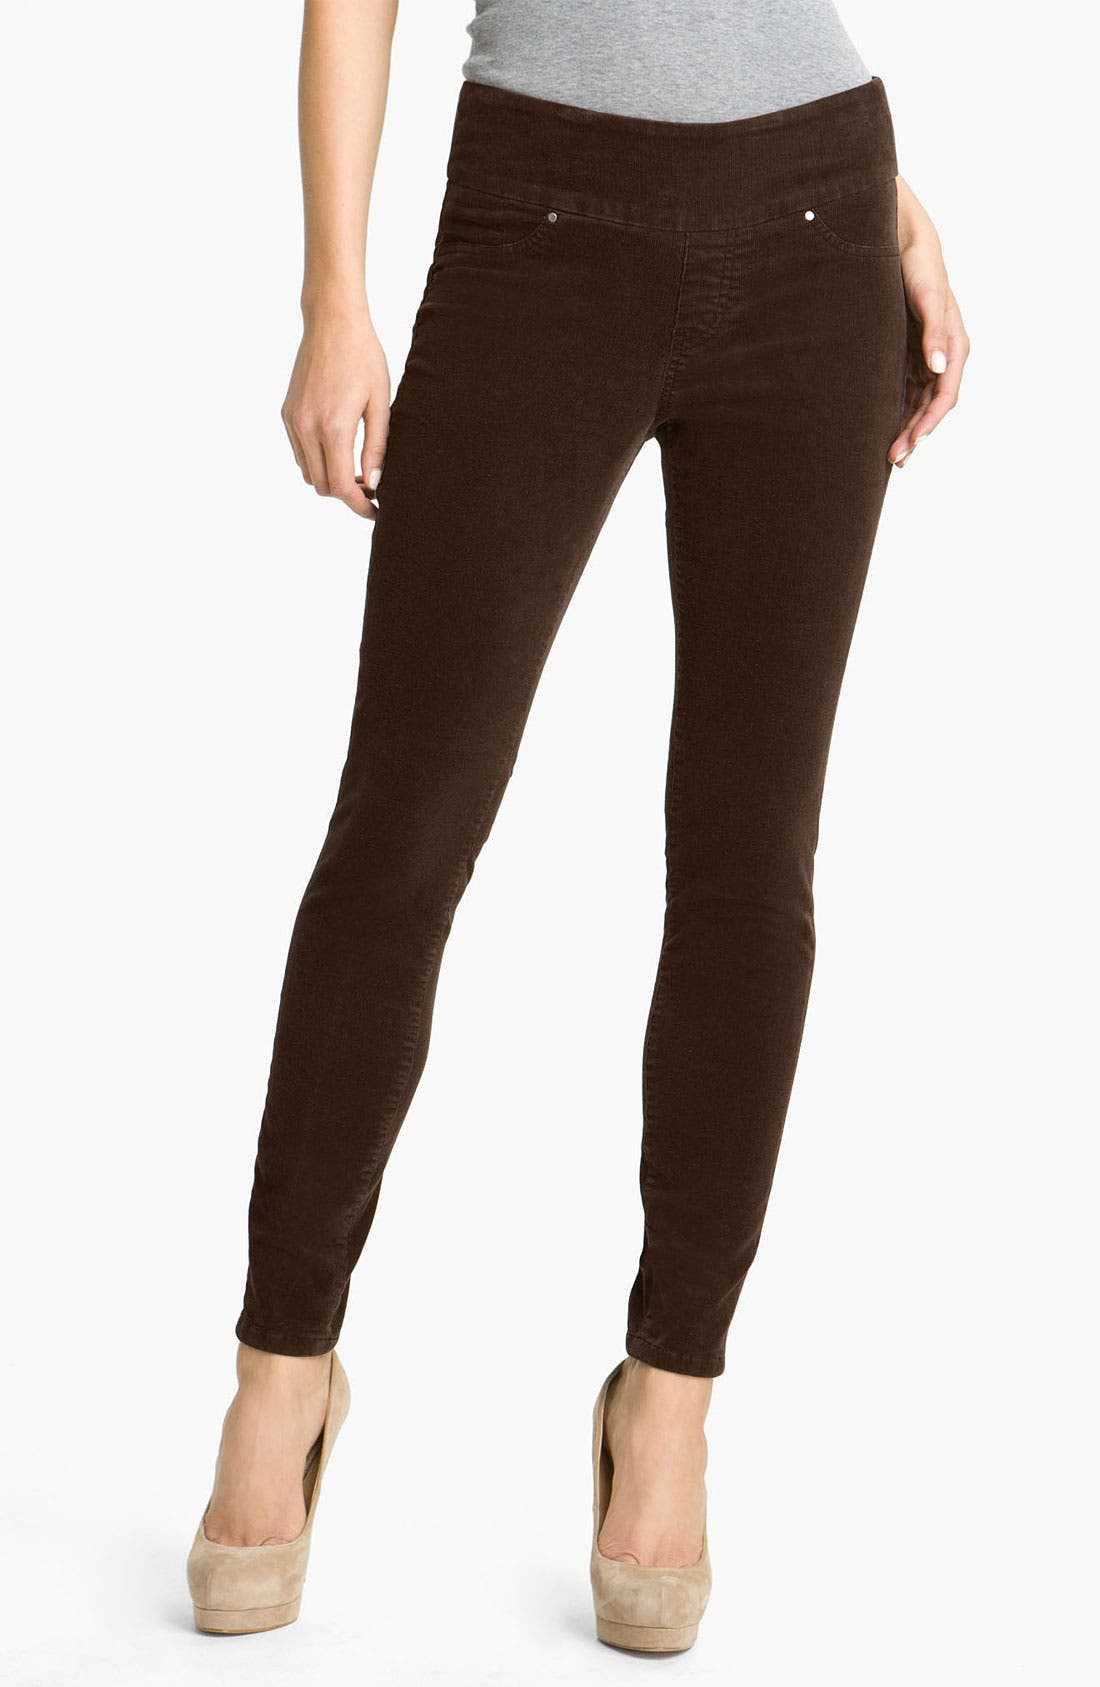 Alternate Image 2  - Jag Jeans 'Nikki' Corduroy Leggings